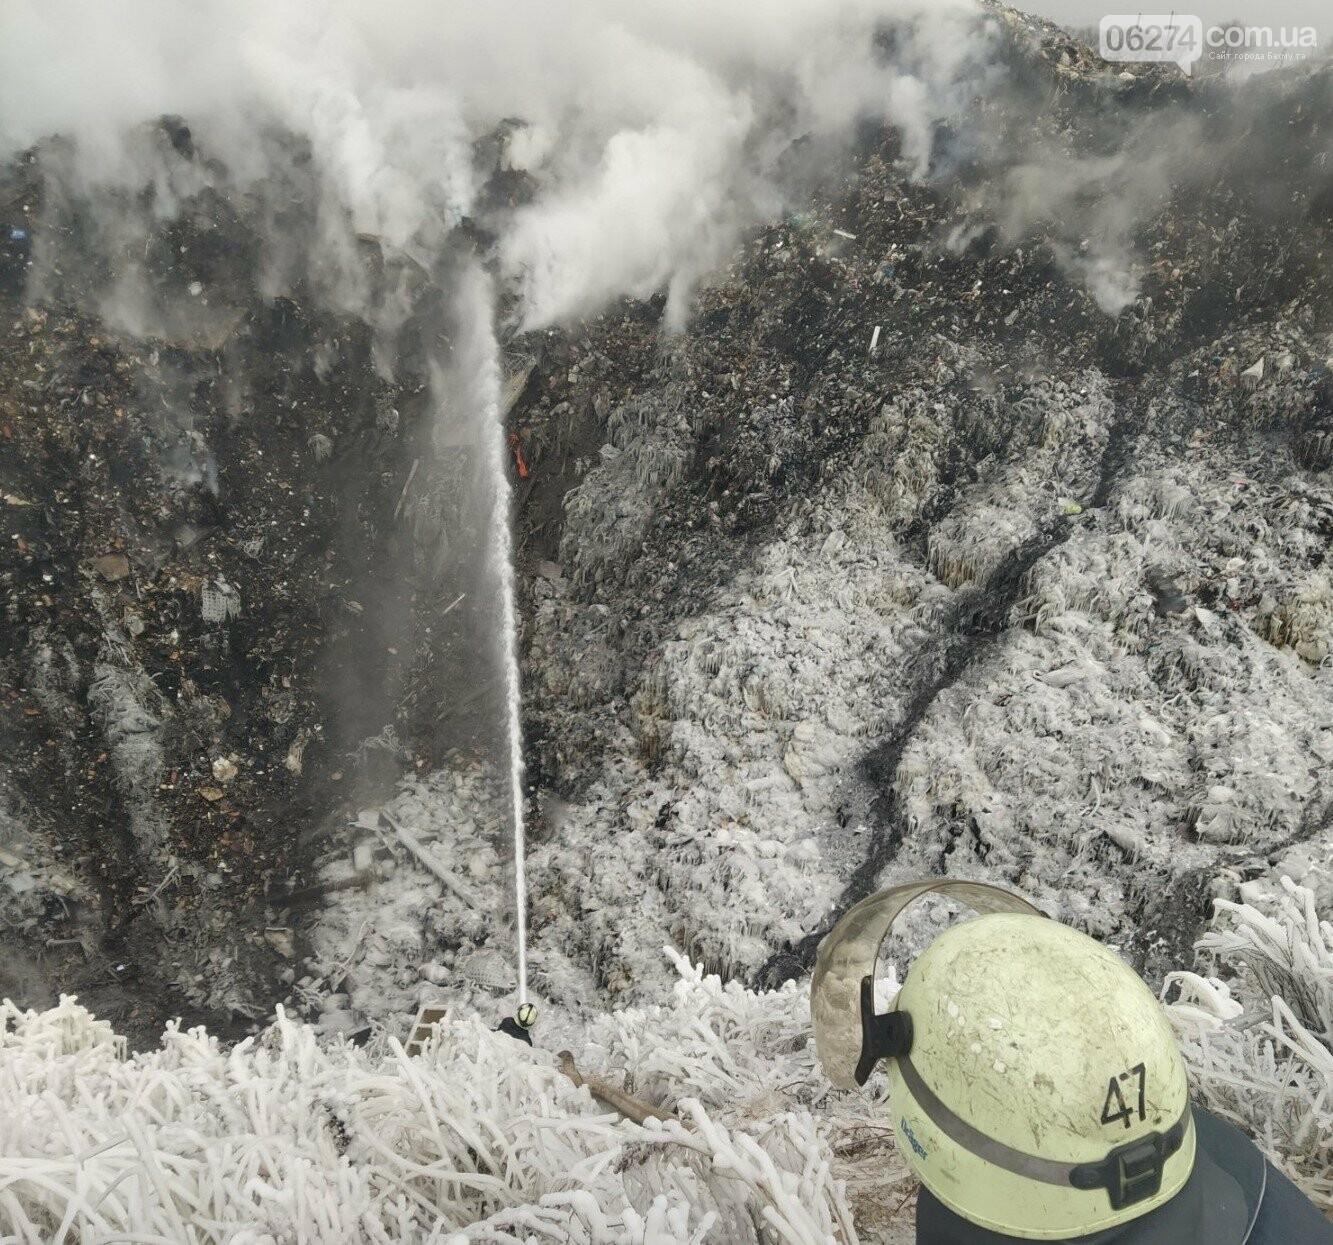 Спасатели ликвидировали пожар на полигоне ТБО вблизи Бахмута, фото-5